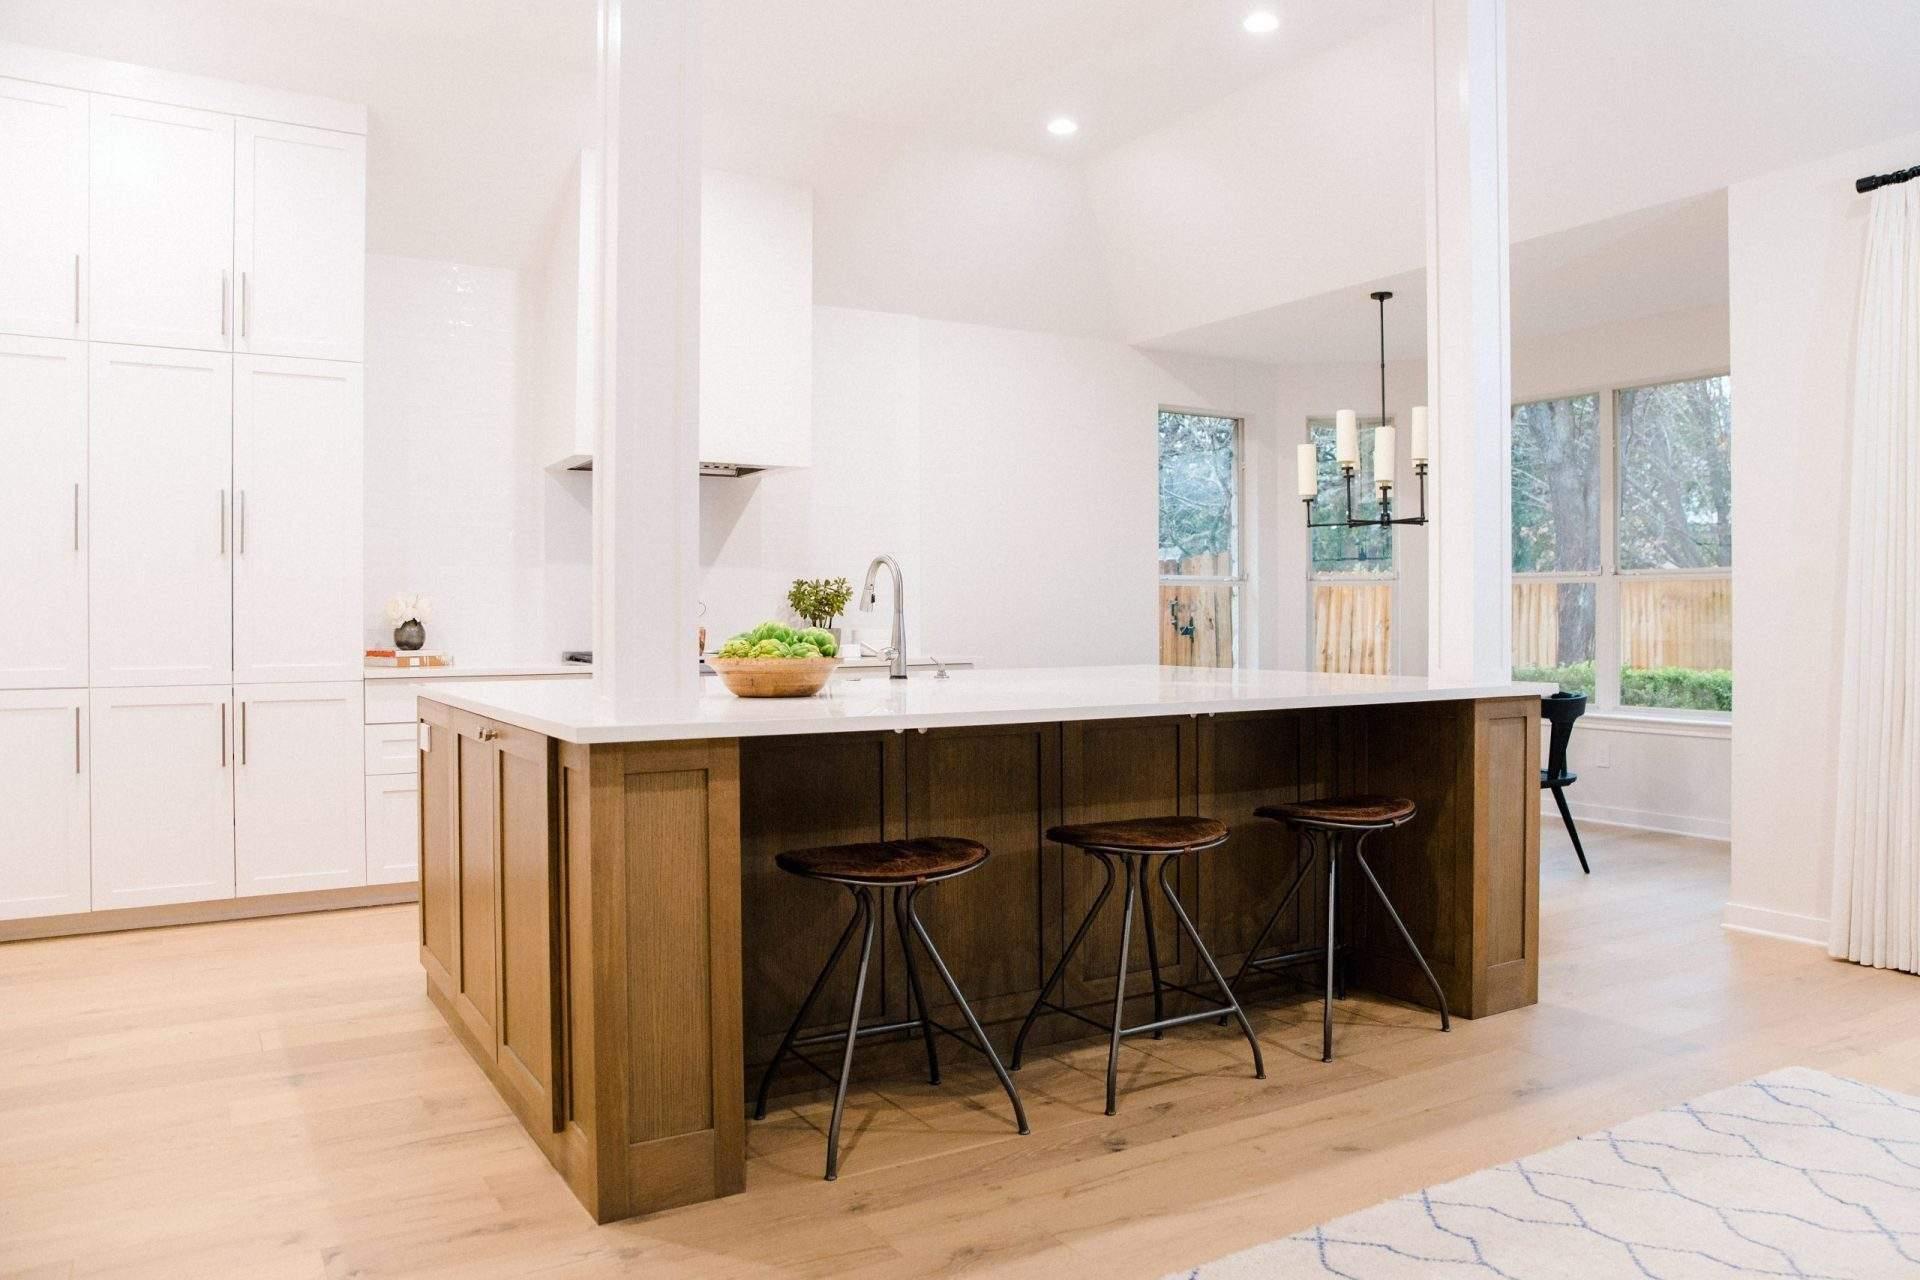 kitchen remodel in Austin Texas   travis country kitchen remodel with sink in island 15   austin, texas